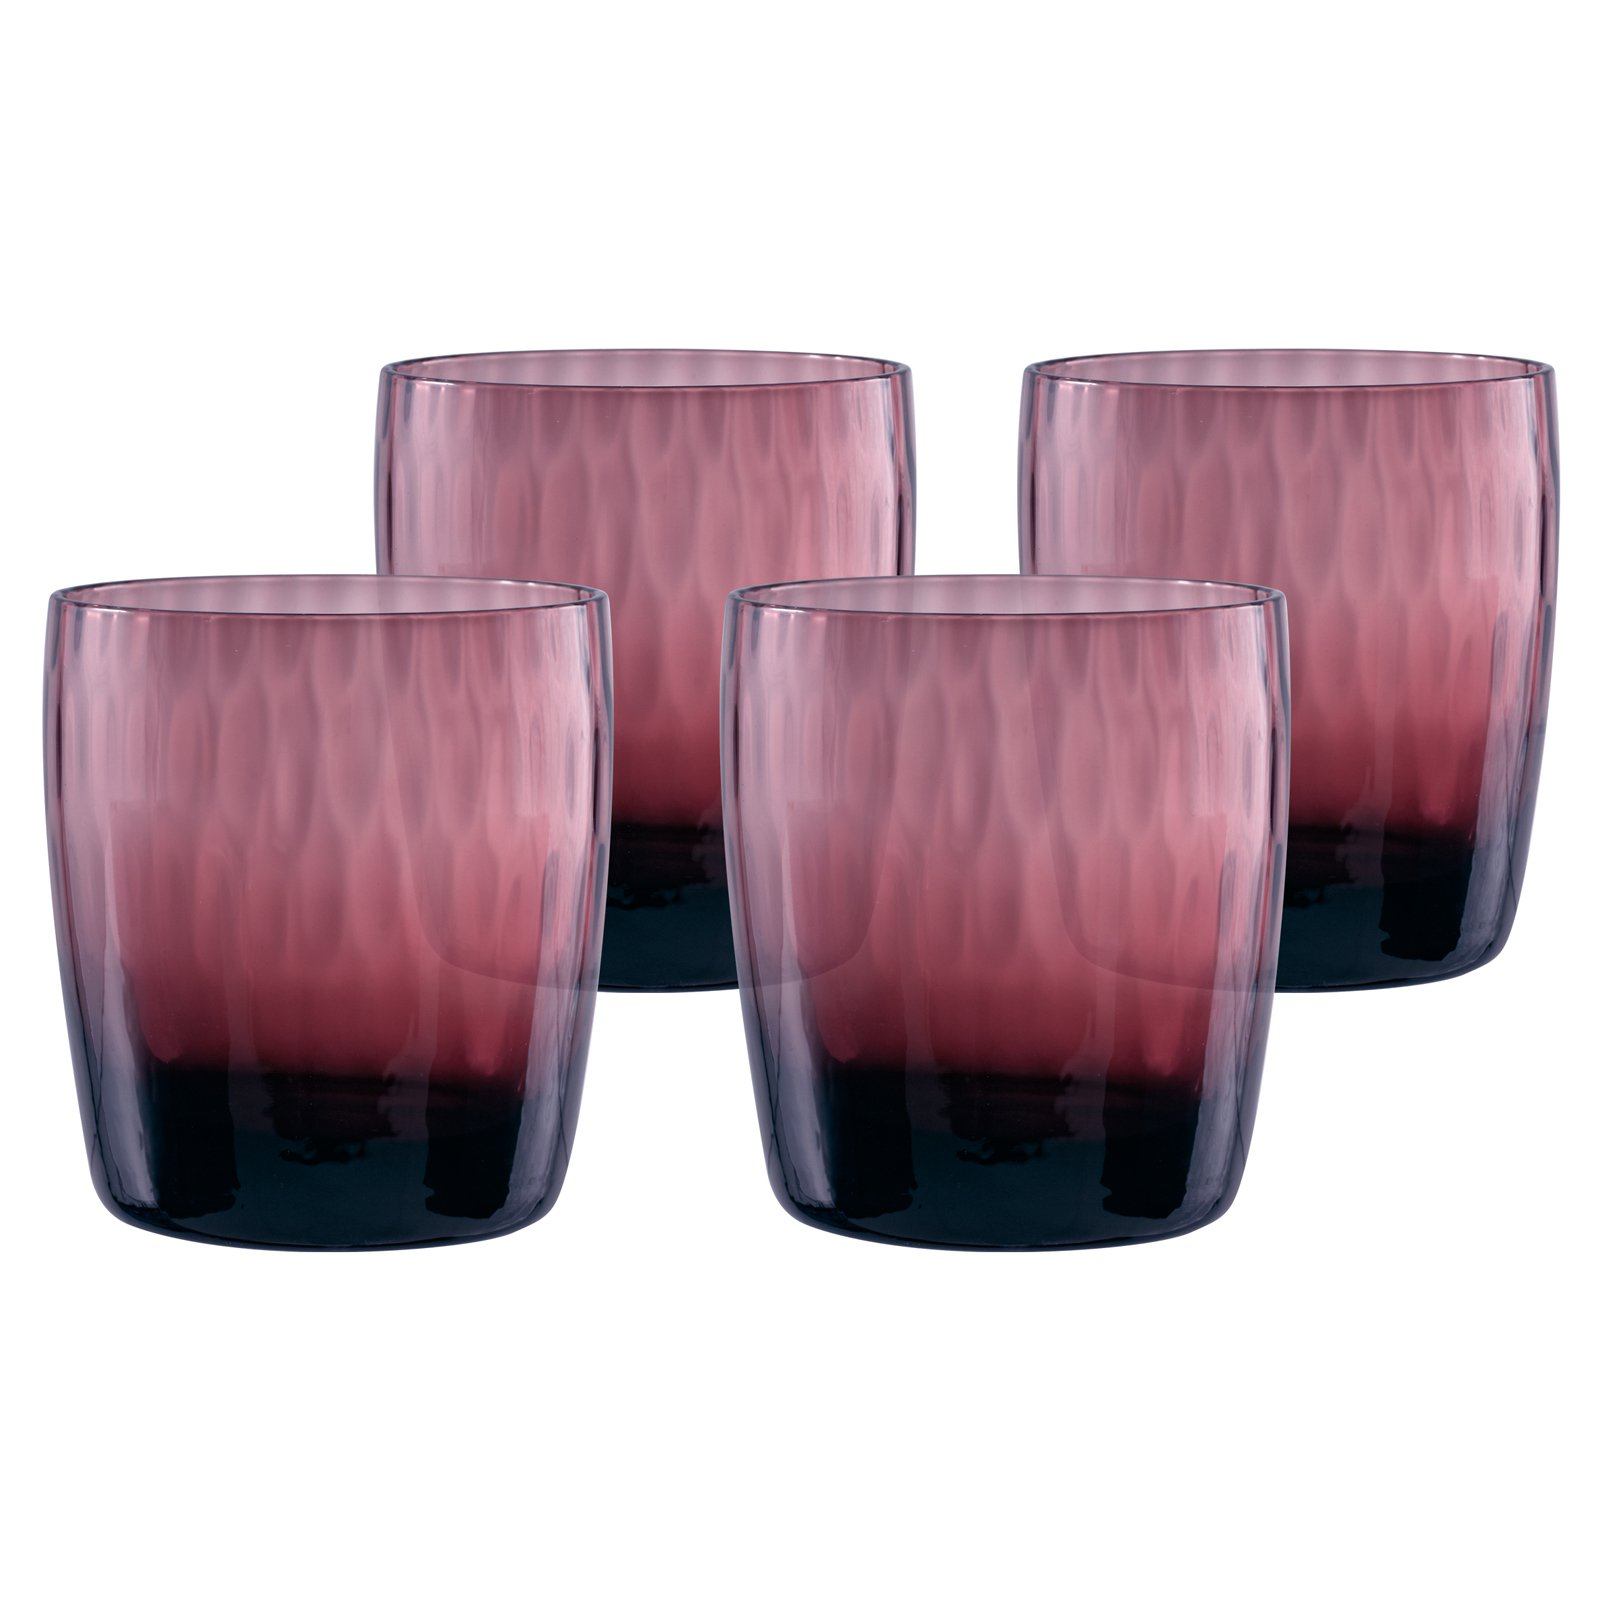 Artland Pebbles DOF Glass - Set of 4